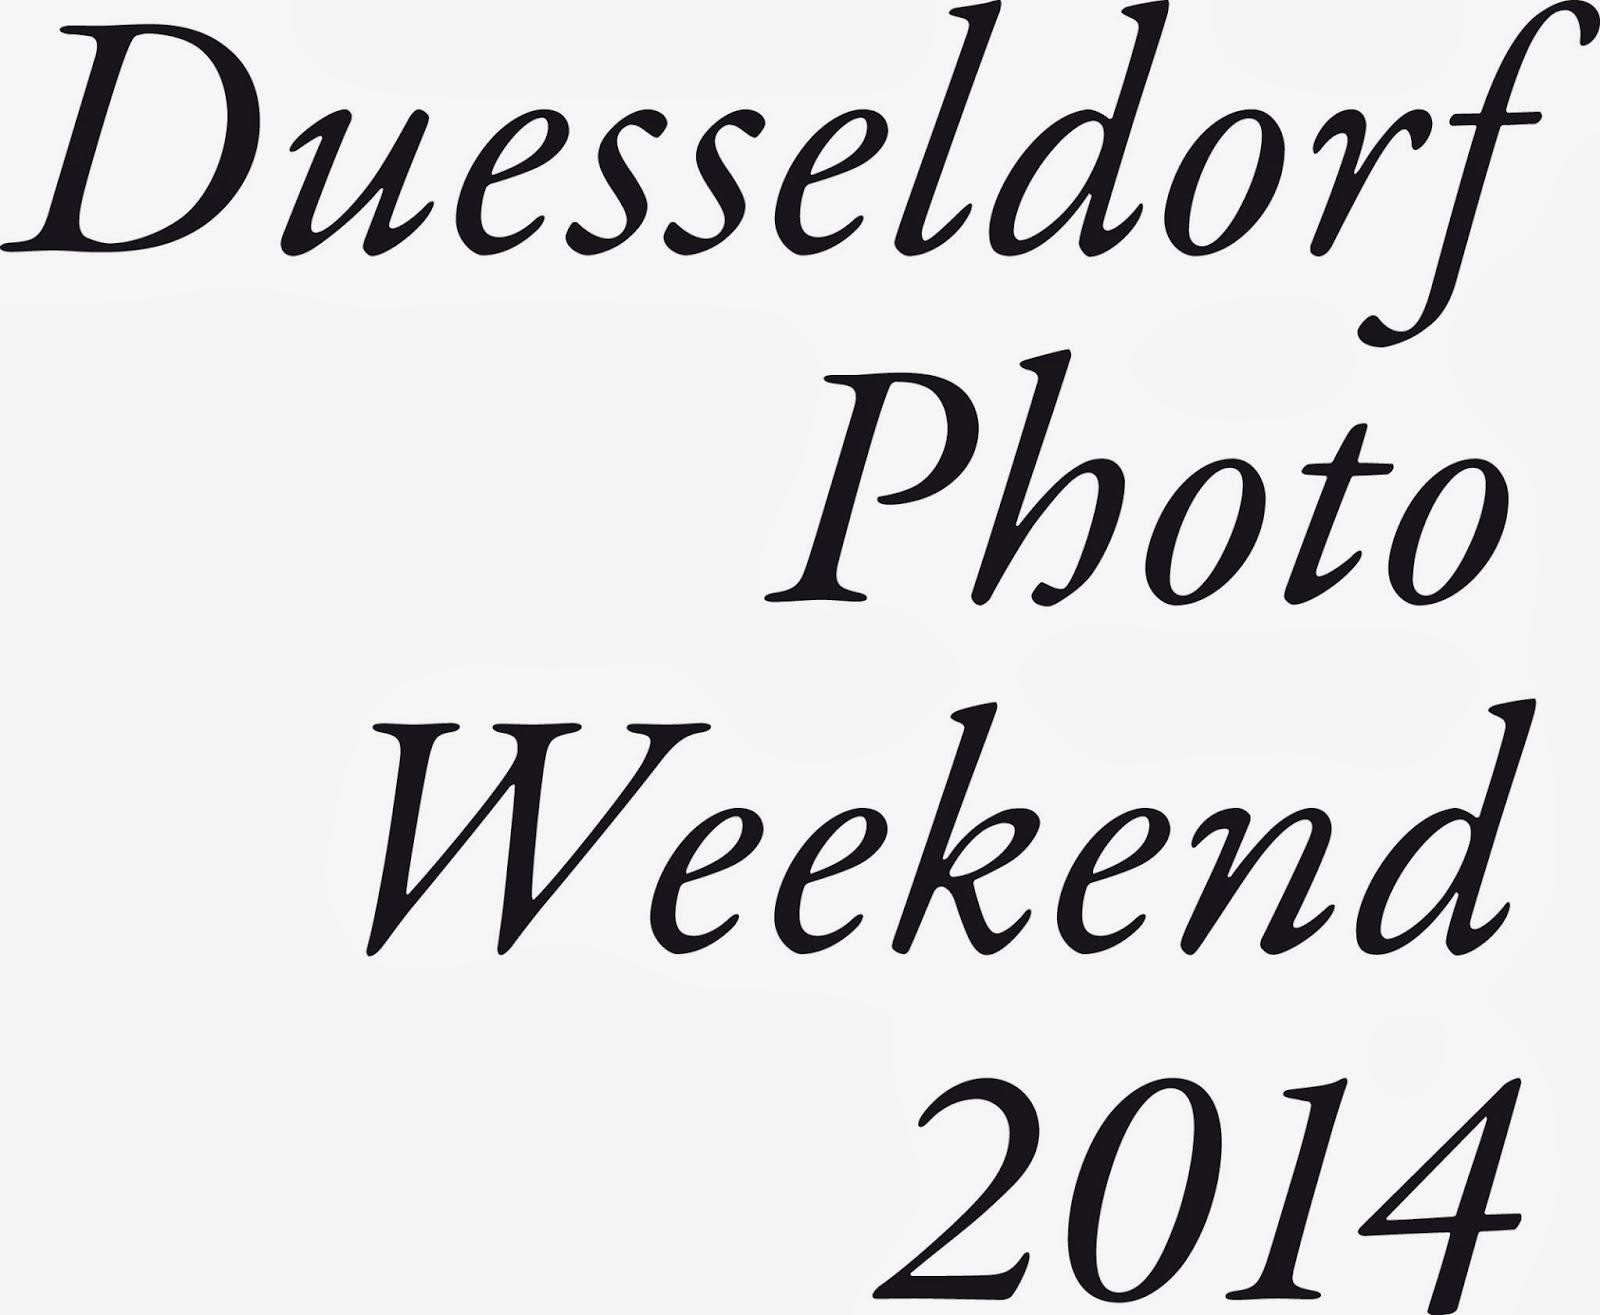 RhineBuzz: Duesseldorf Photo Weekend 2014